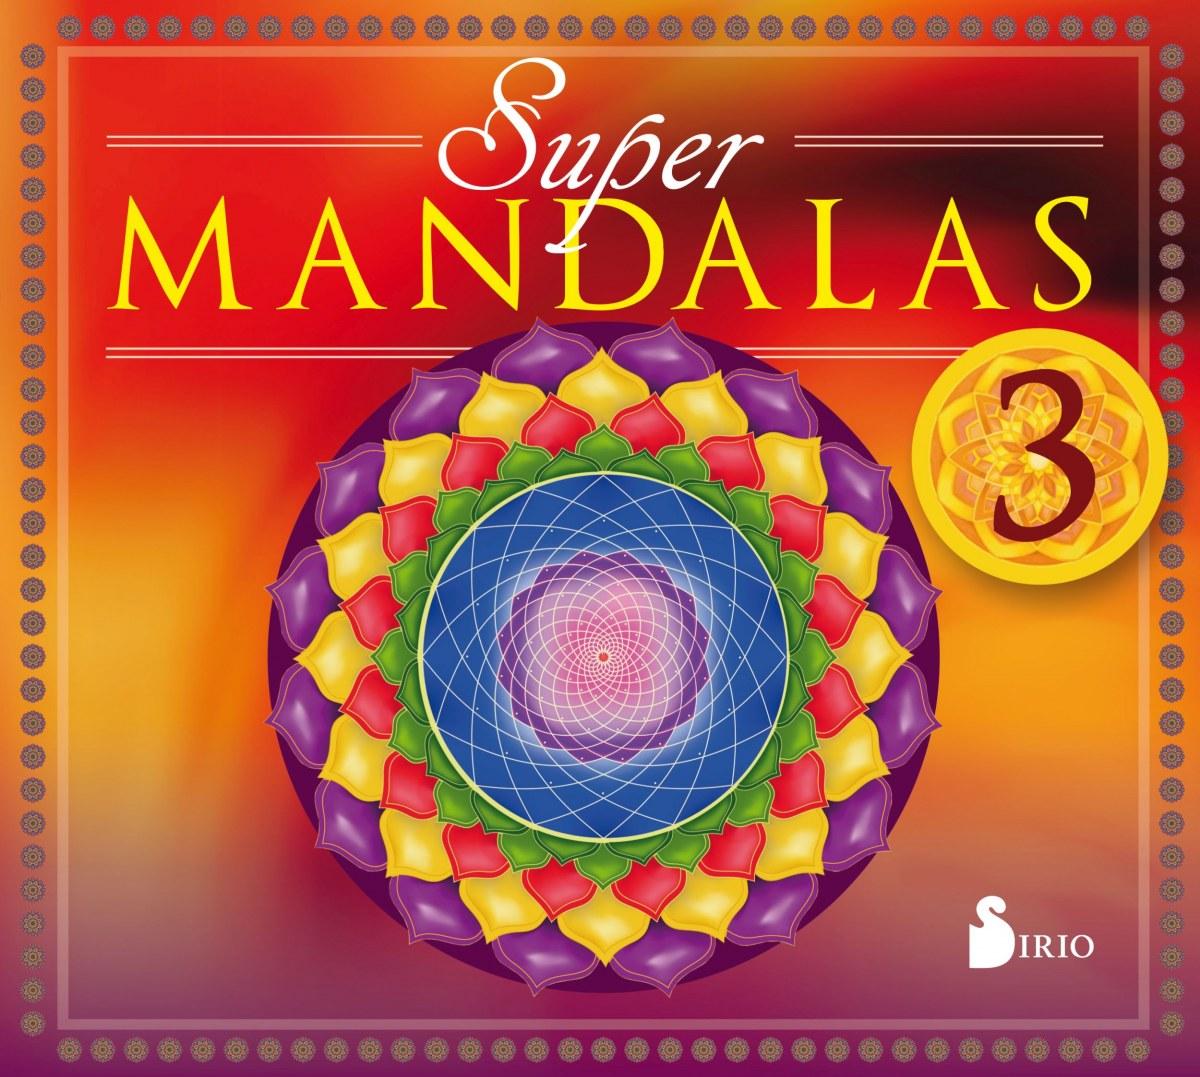 SUPER MANDALAS 9788416579839